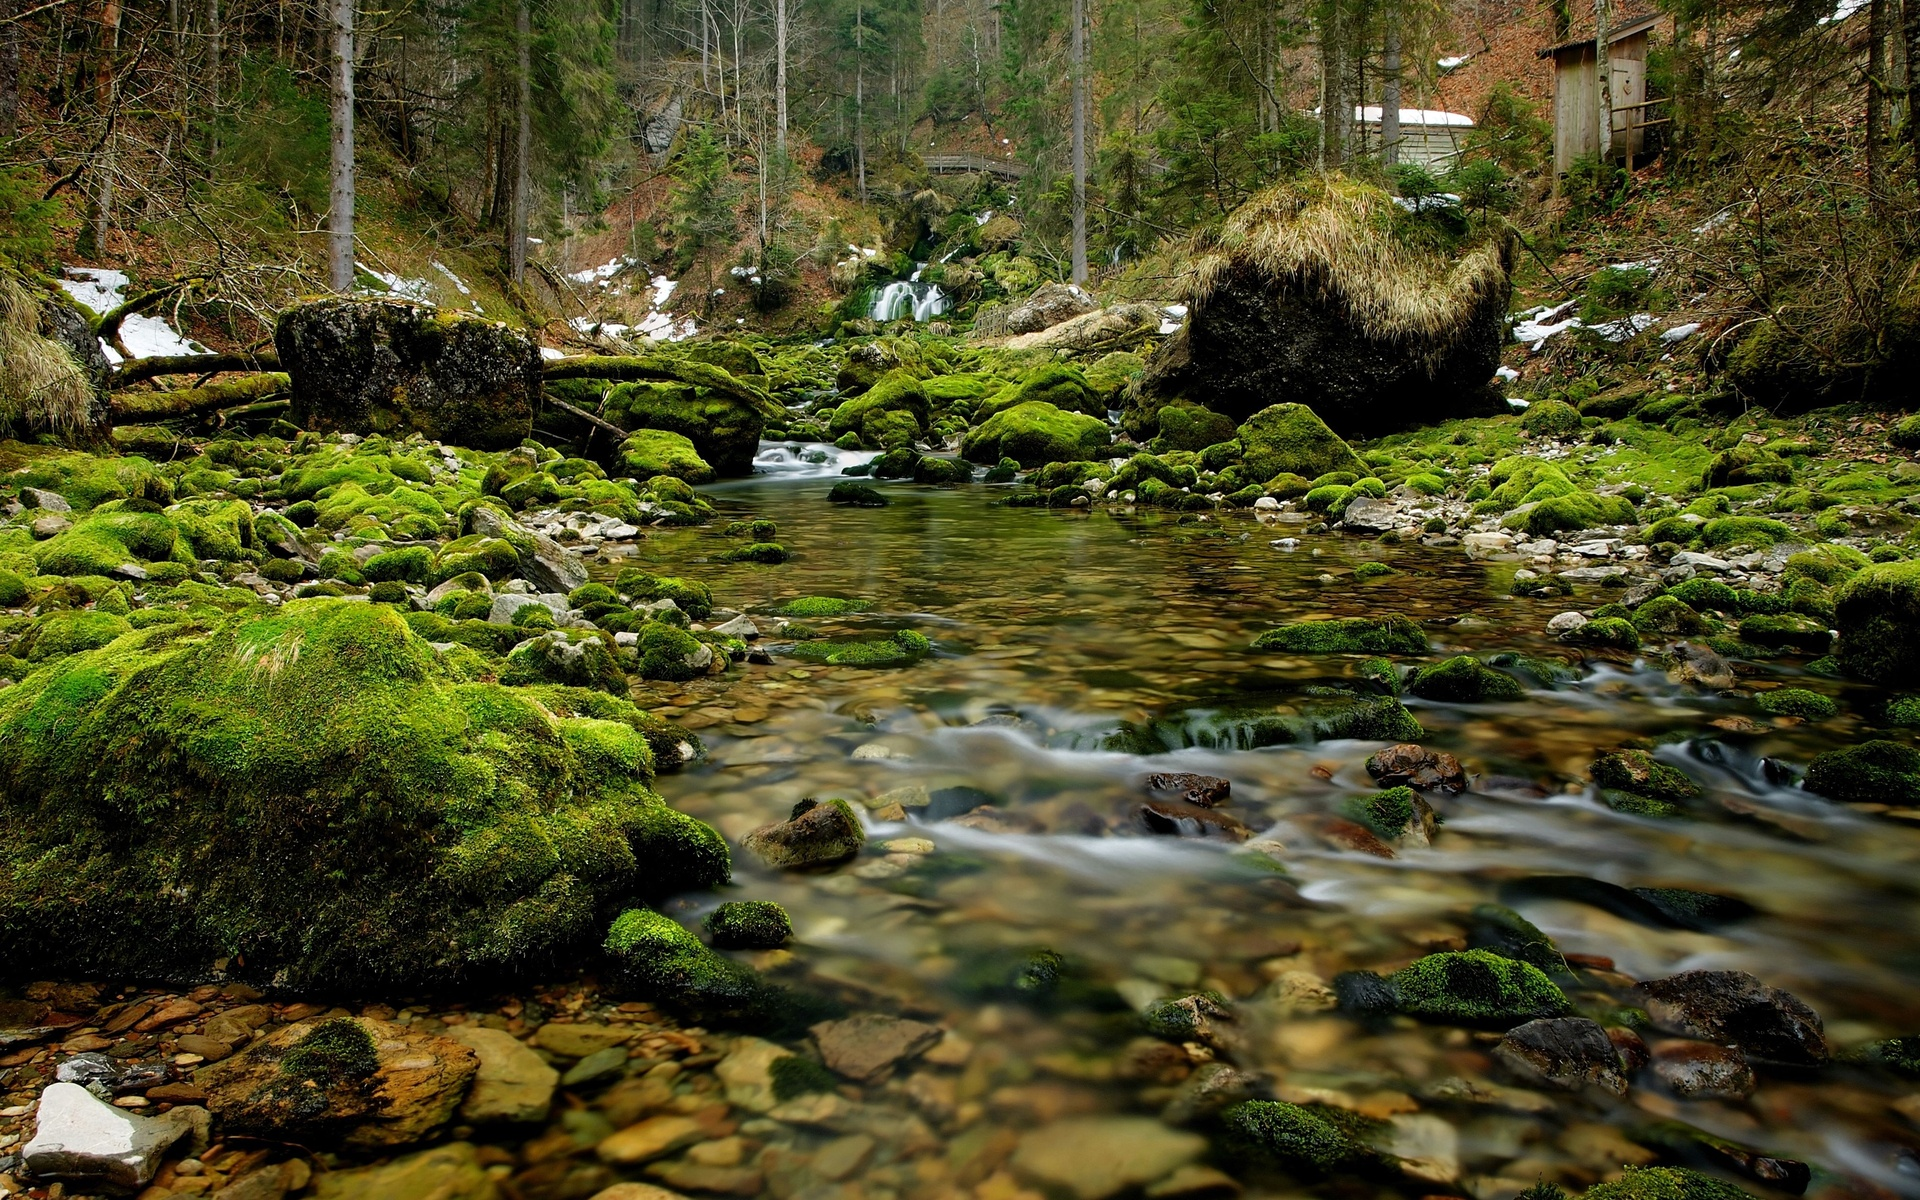 river rocks wood moss nature wallpaper background 1920x1200